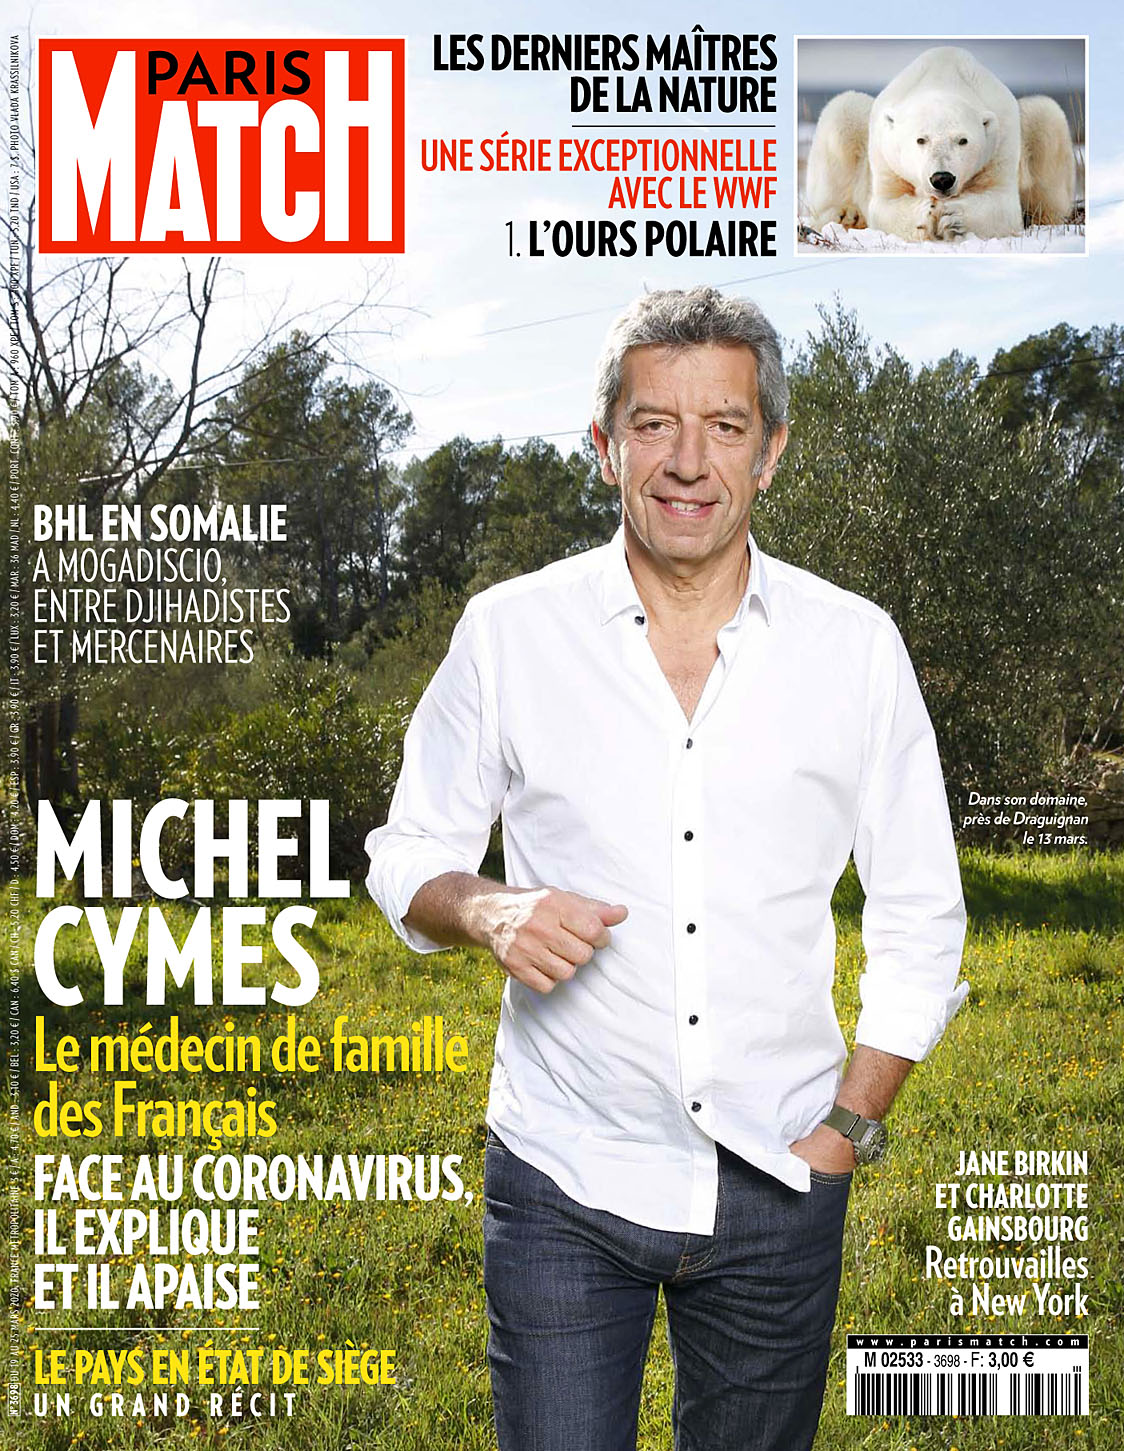 Paris Match 200319.jpg